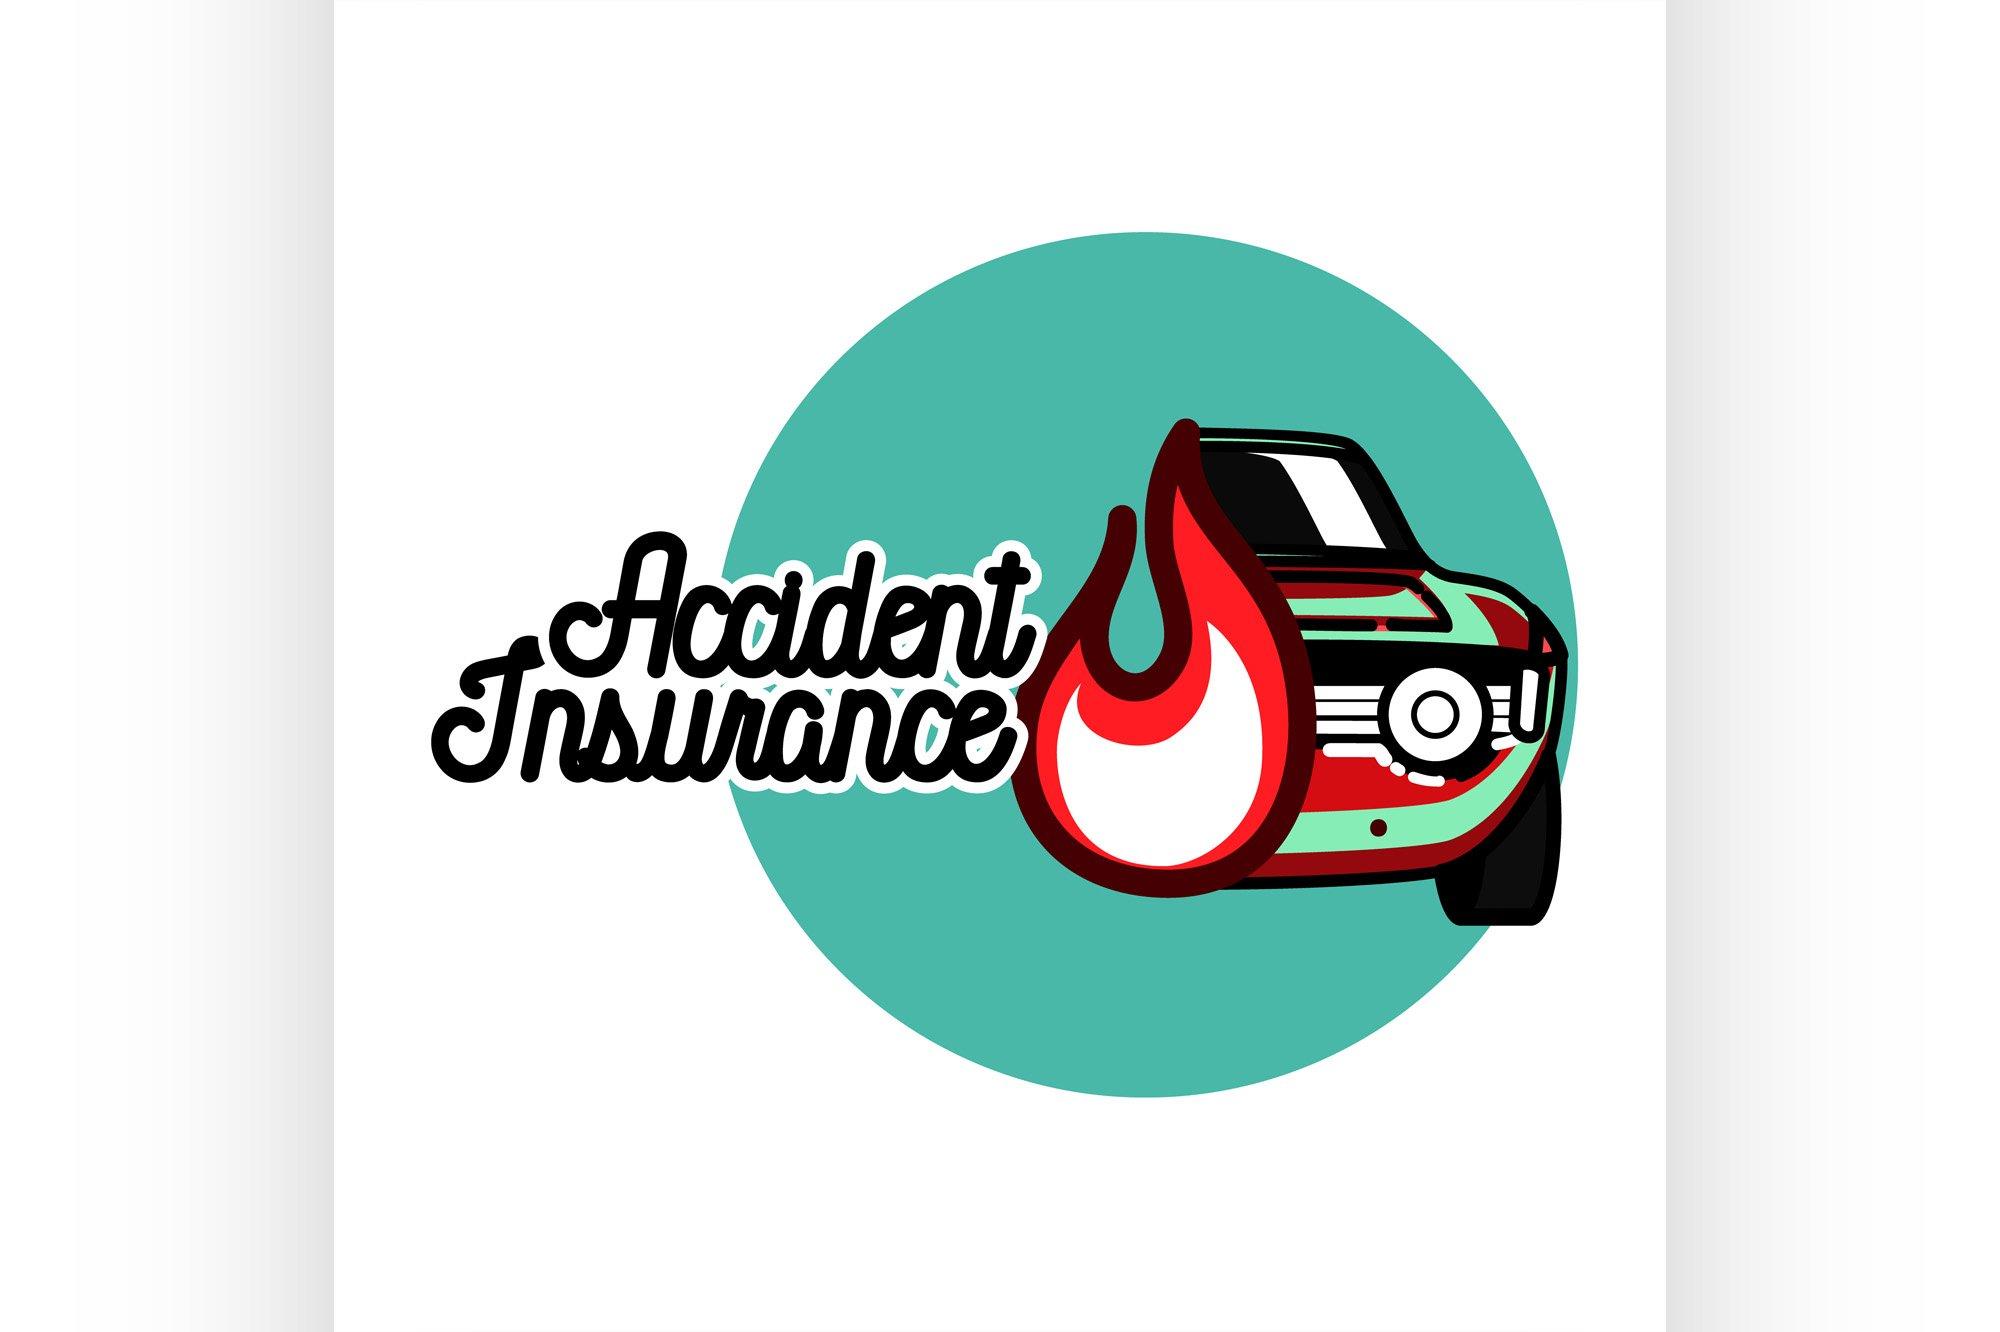 Color vintage accident insurance emblem example image 1